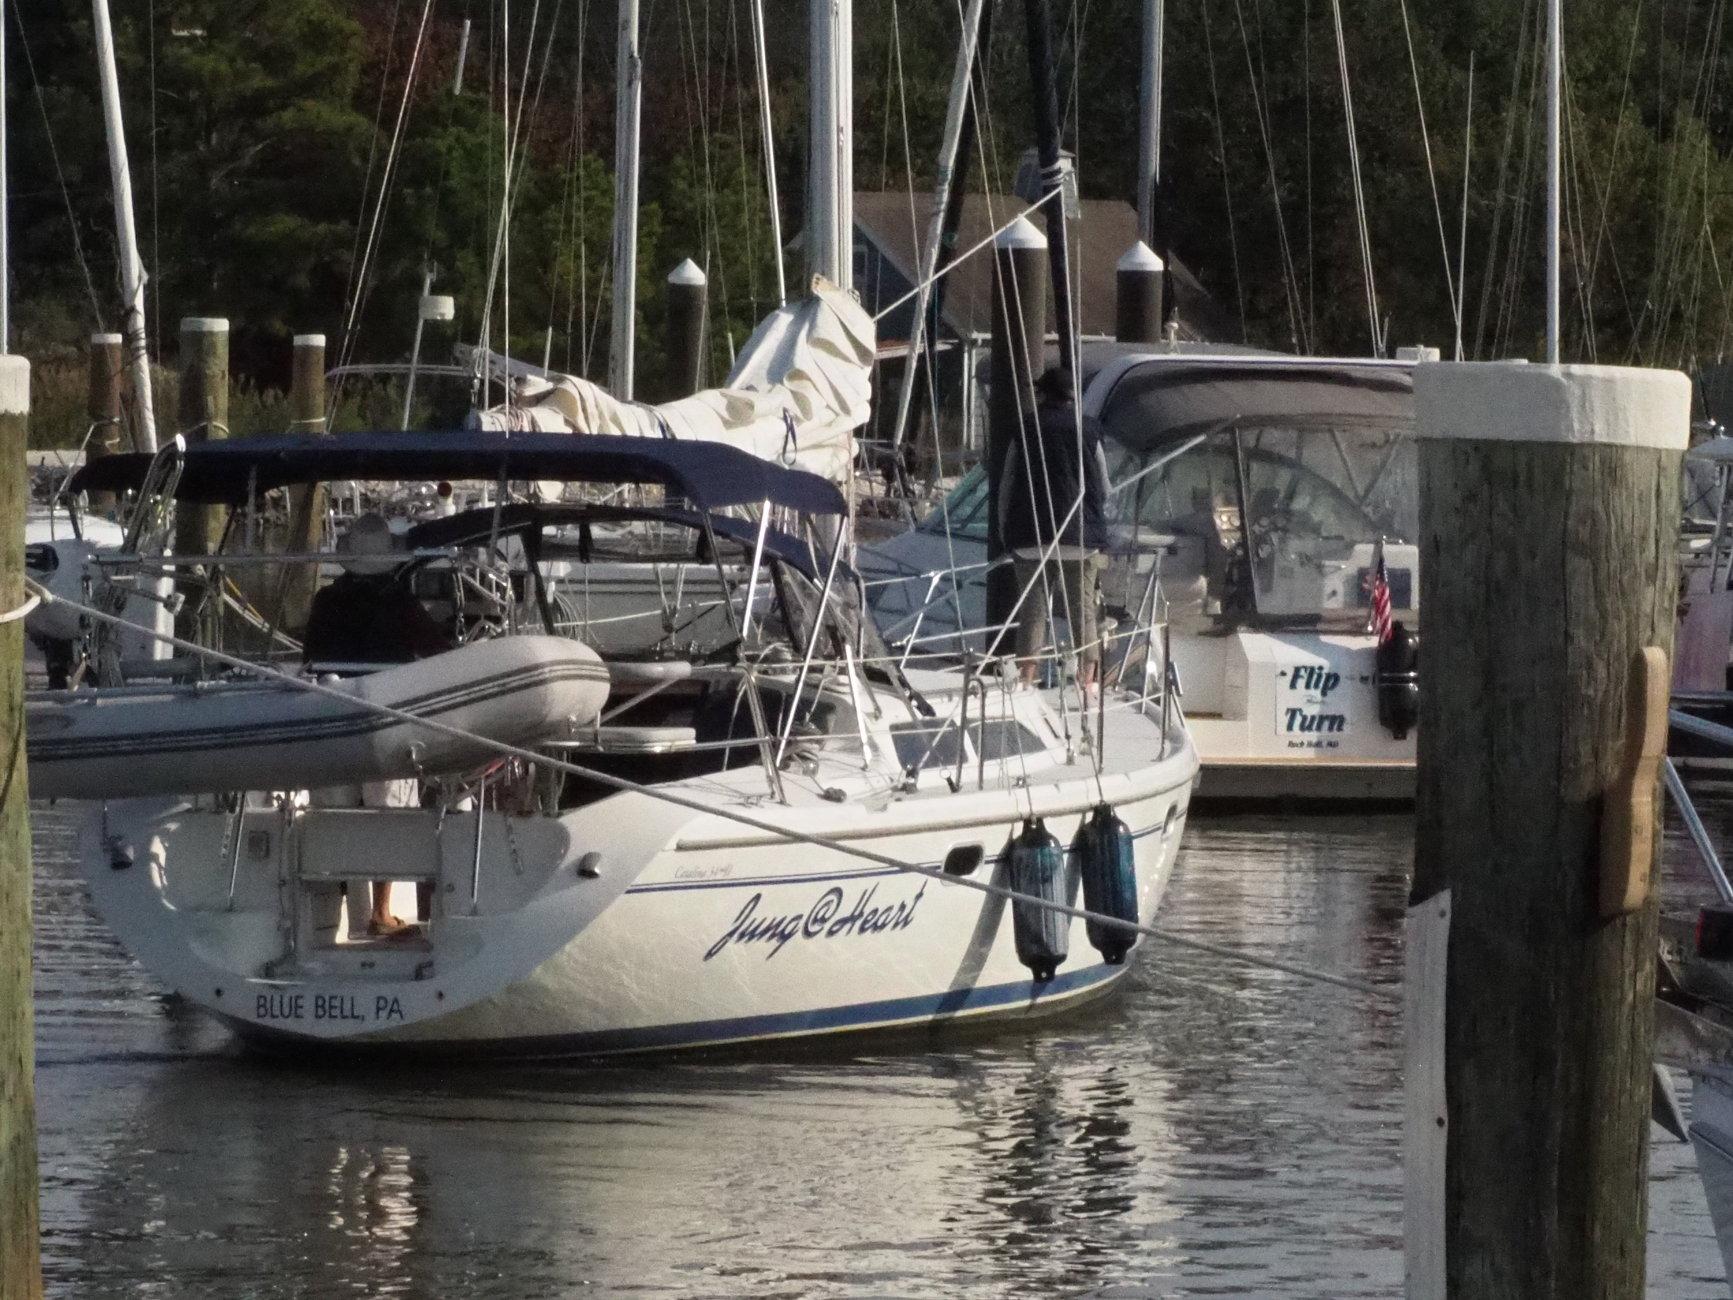 Sailing on the Chesapeake #11